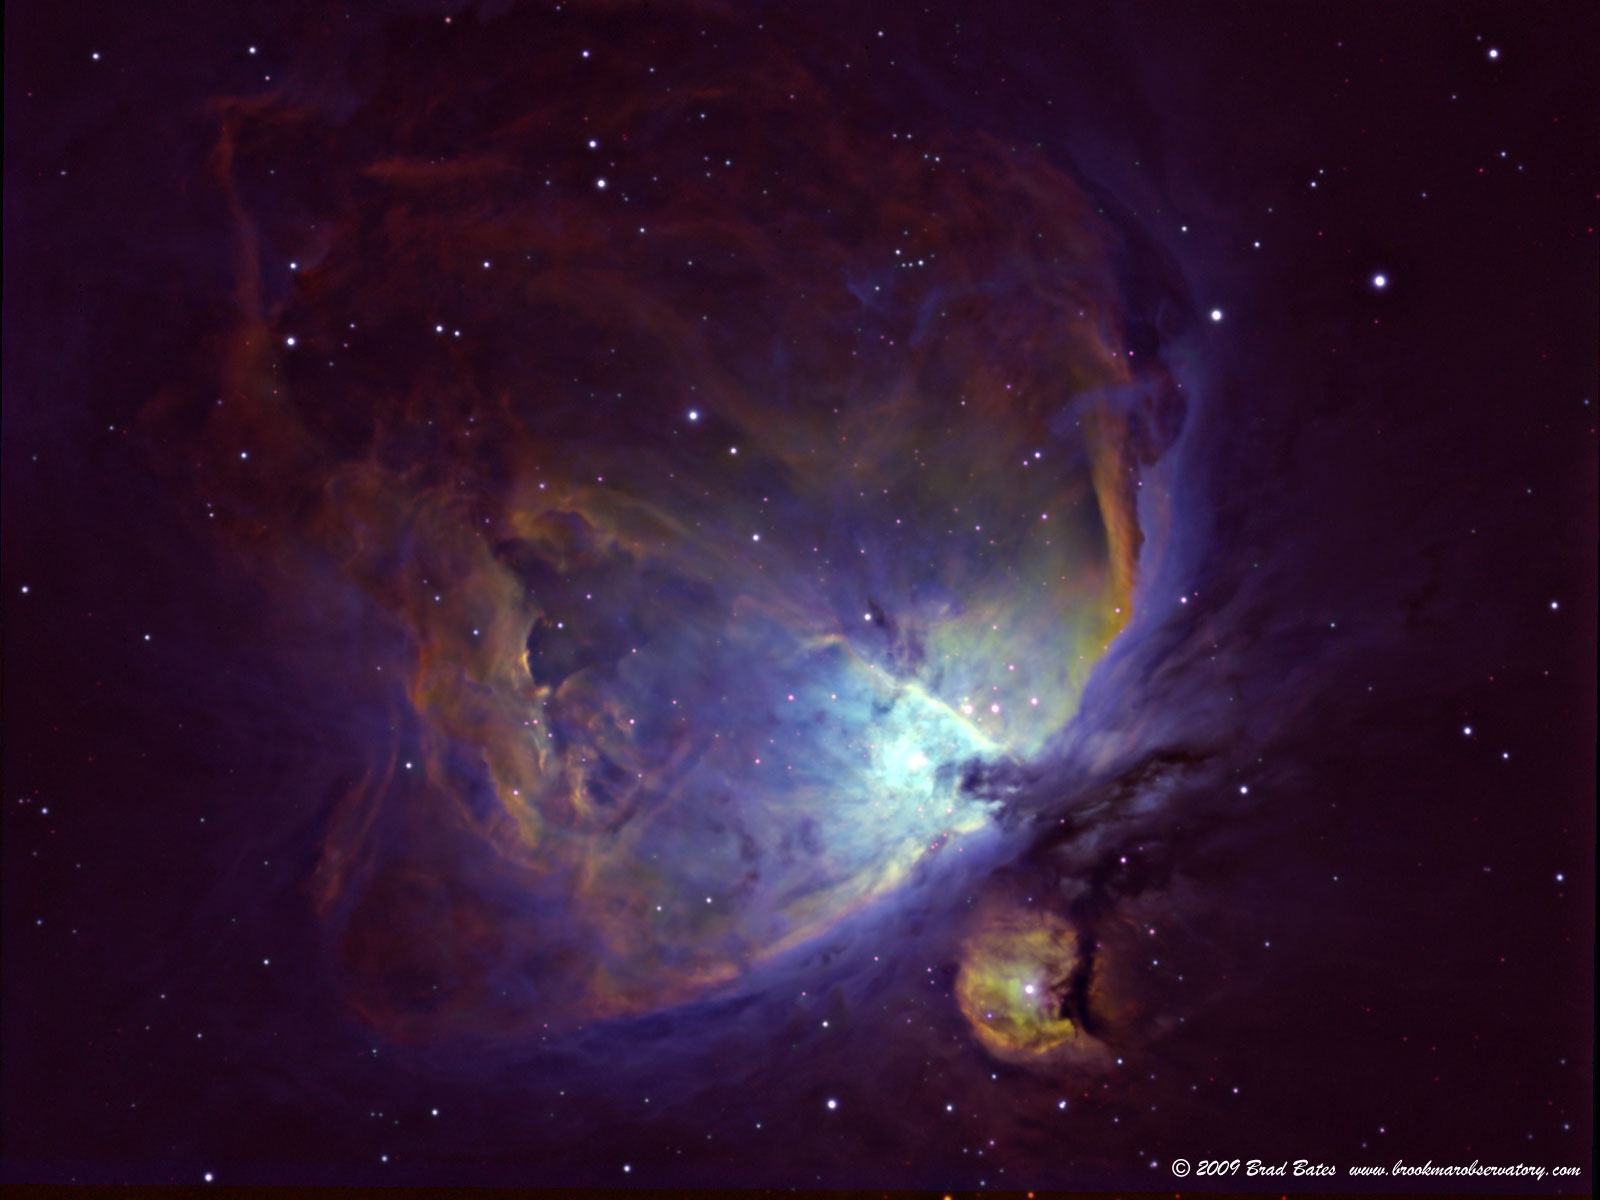 Hubble Orion Nebula Wallpaper - WallpaperSafari